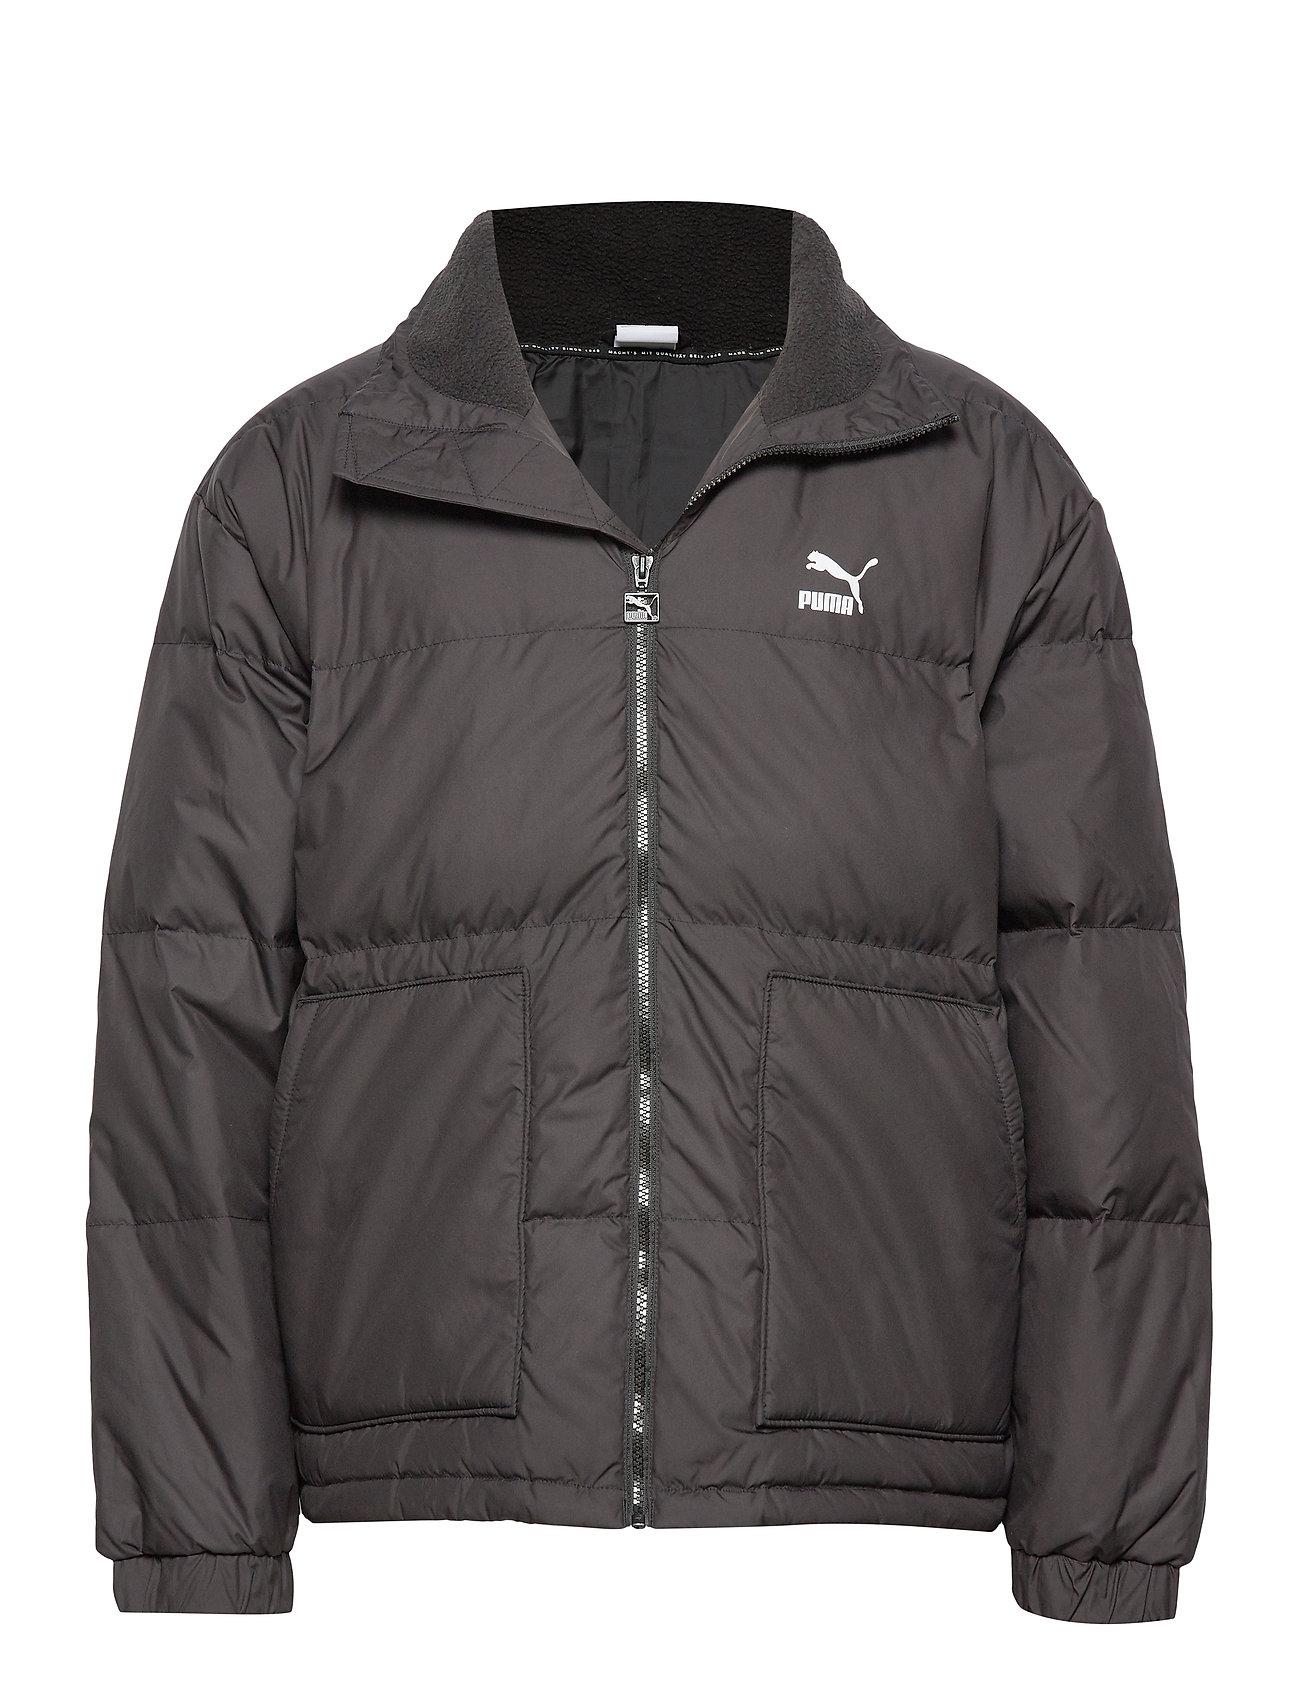 PUMA Classics Down Jacket - PUMA BLACK